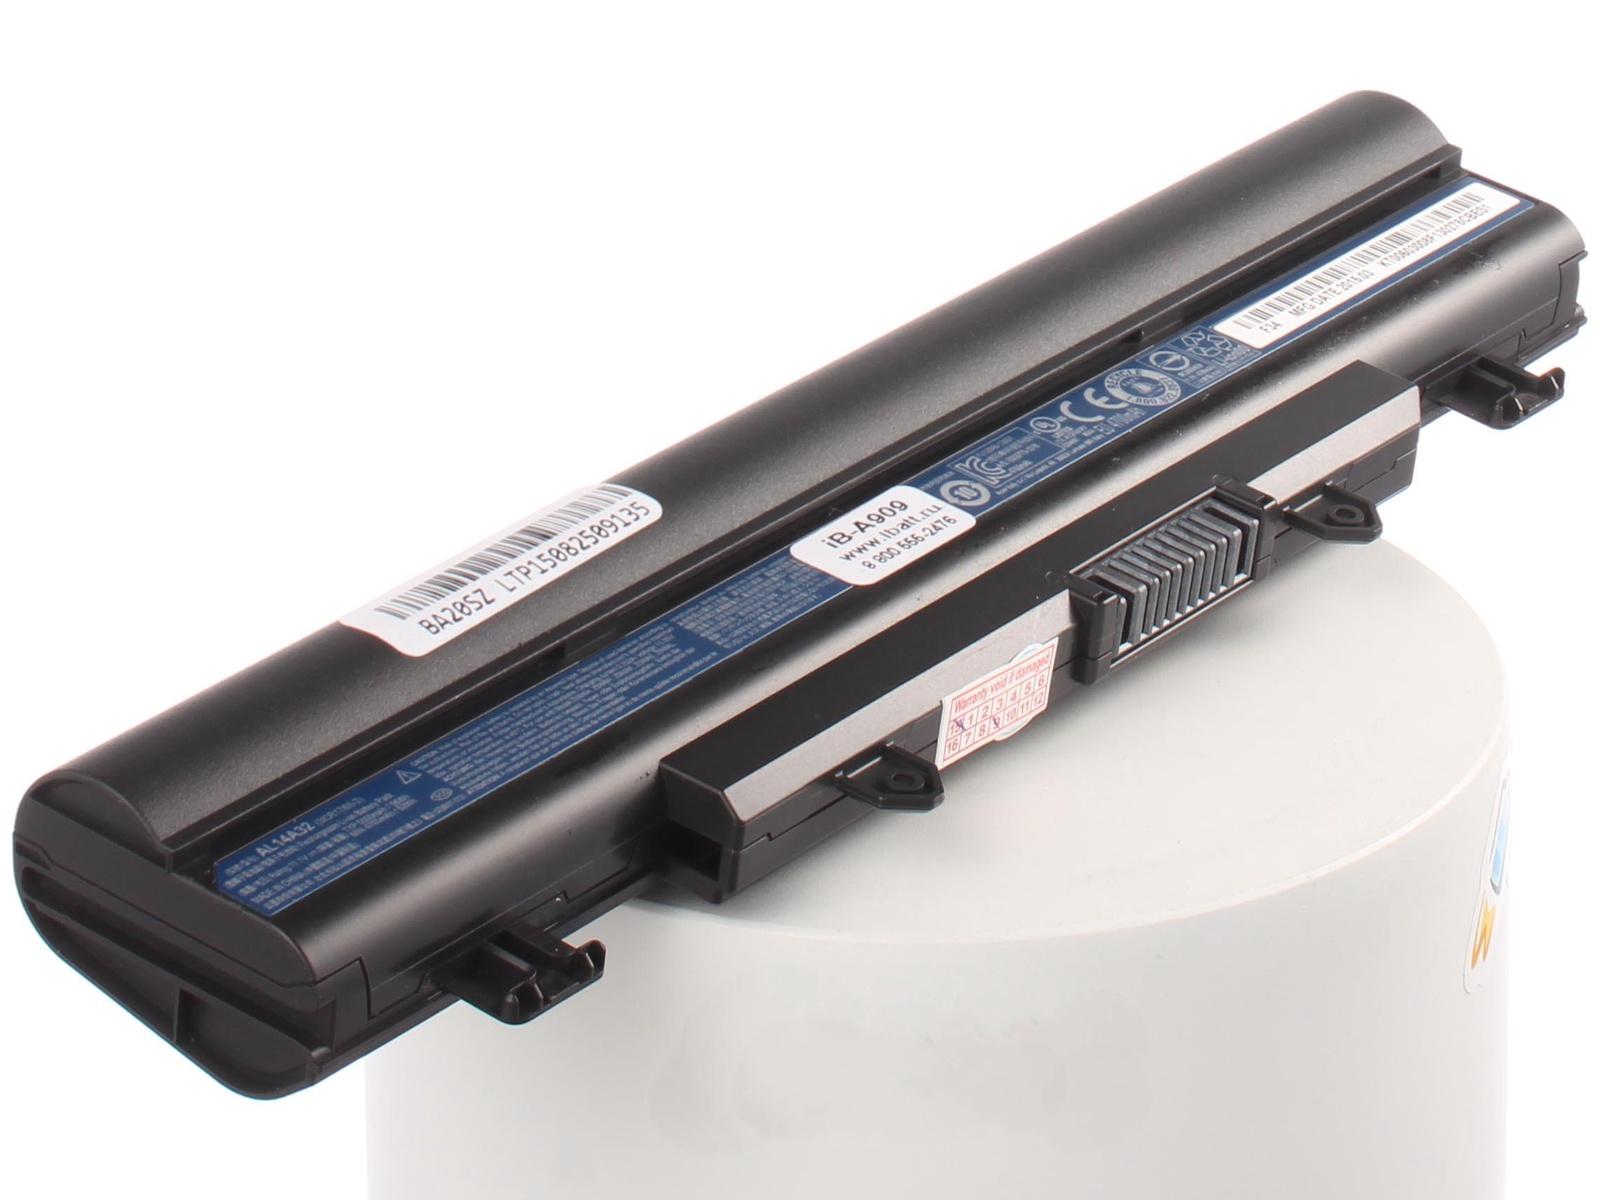 Аккумулятор для ноутбука iBatt для Acer ASPIRE E5-511-P98T, Aspire E5-521-493T, Aspire E5-531-P5RC, Aspire E5-571-7776, Aspire E5-571G-31HV, Aspire E5-571G-34N5, Aspire E5-571G-3504, Aspire E5-571G-37BH, Aspire E5-571G-392W acer aspire e5 573 331j